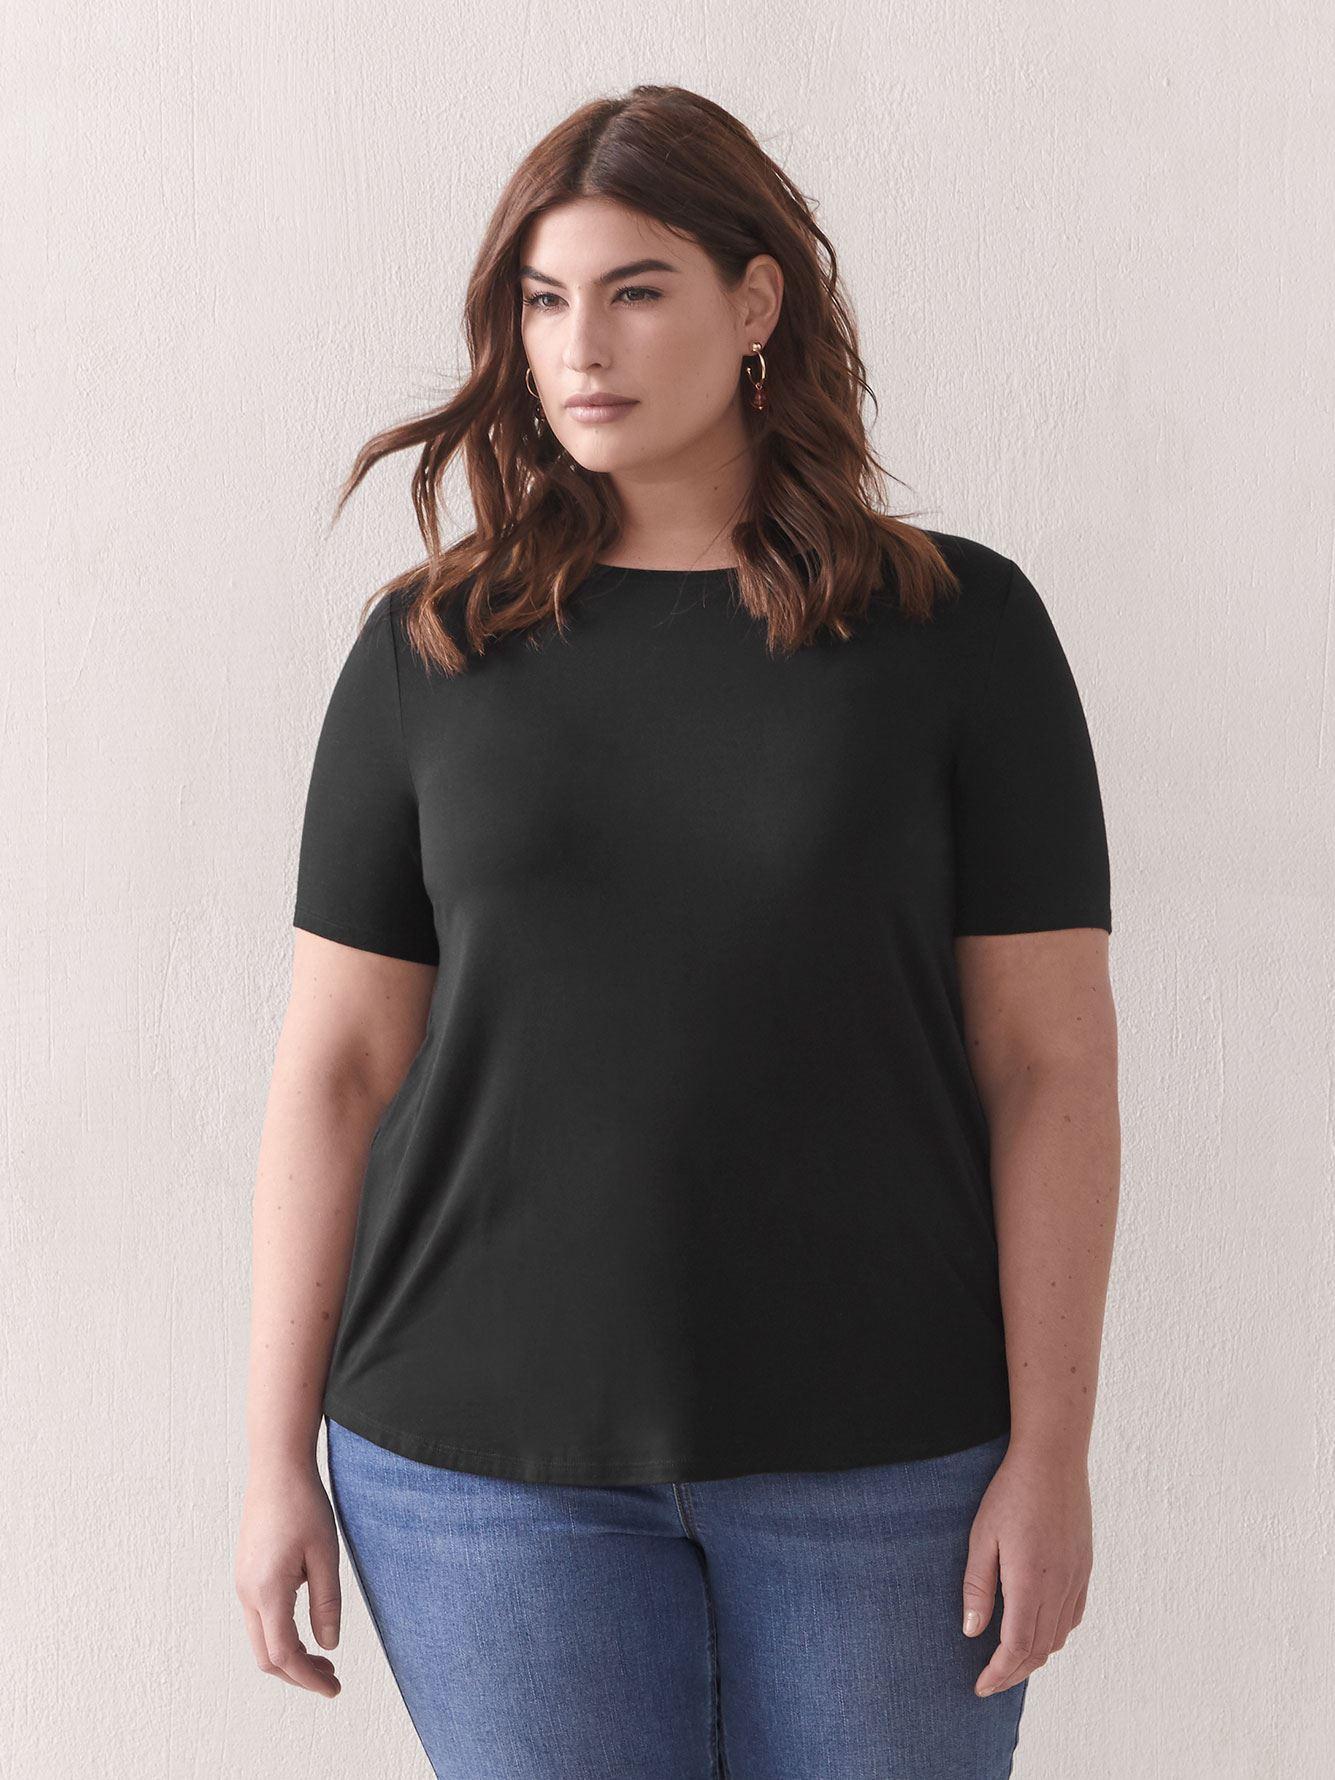 Modern Viscose Elastane T-Shirt - Addition Elle